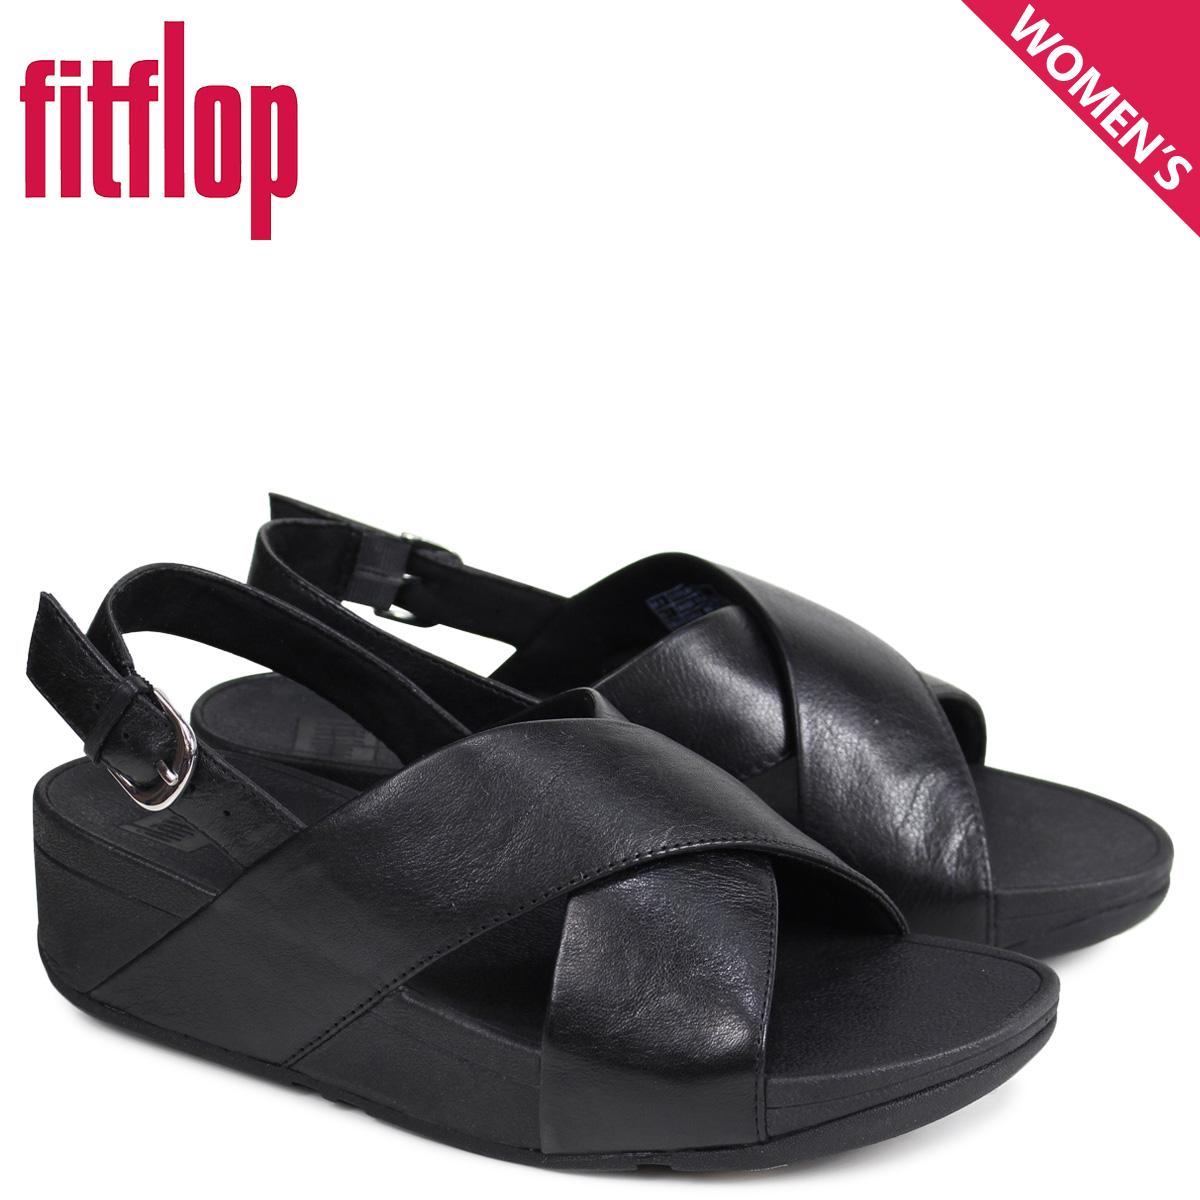 3a3f94db7 FitFlop fitting FLOP sandals Lulu LULU CROSS BACK-STRAP SANDALS LEATHER  Lady s K03 black